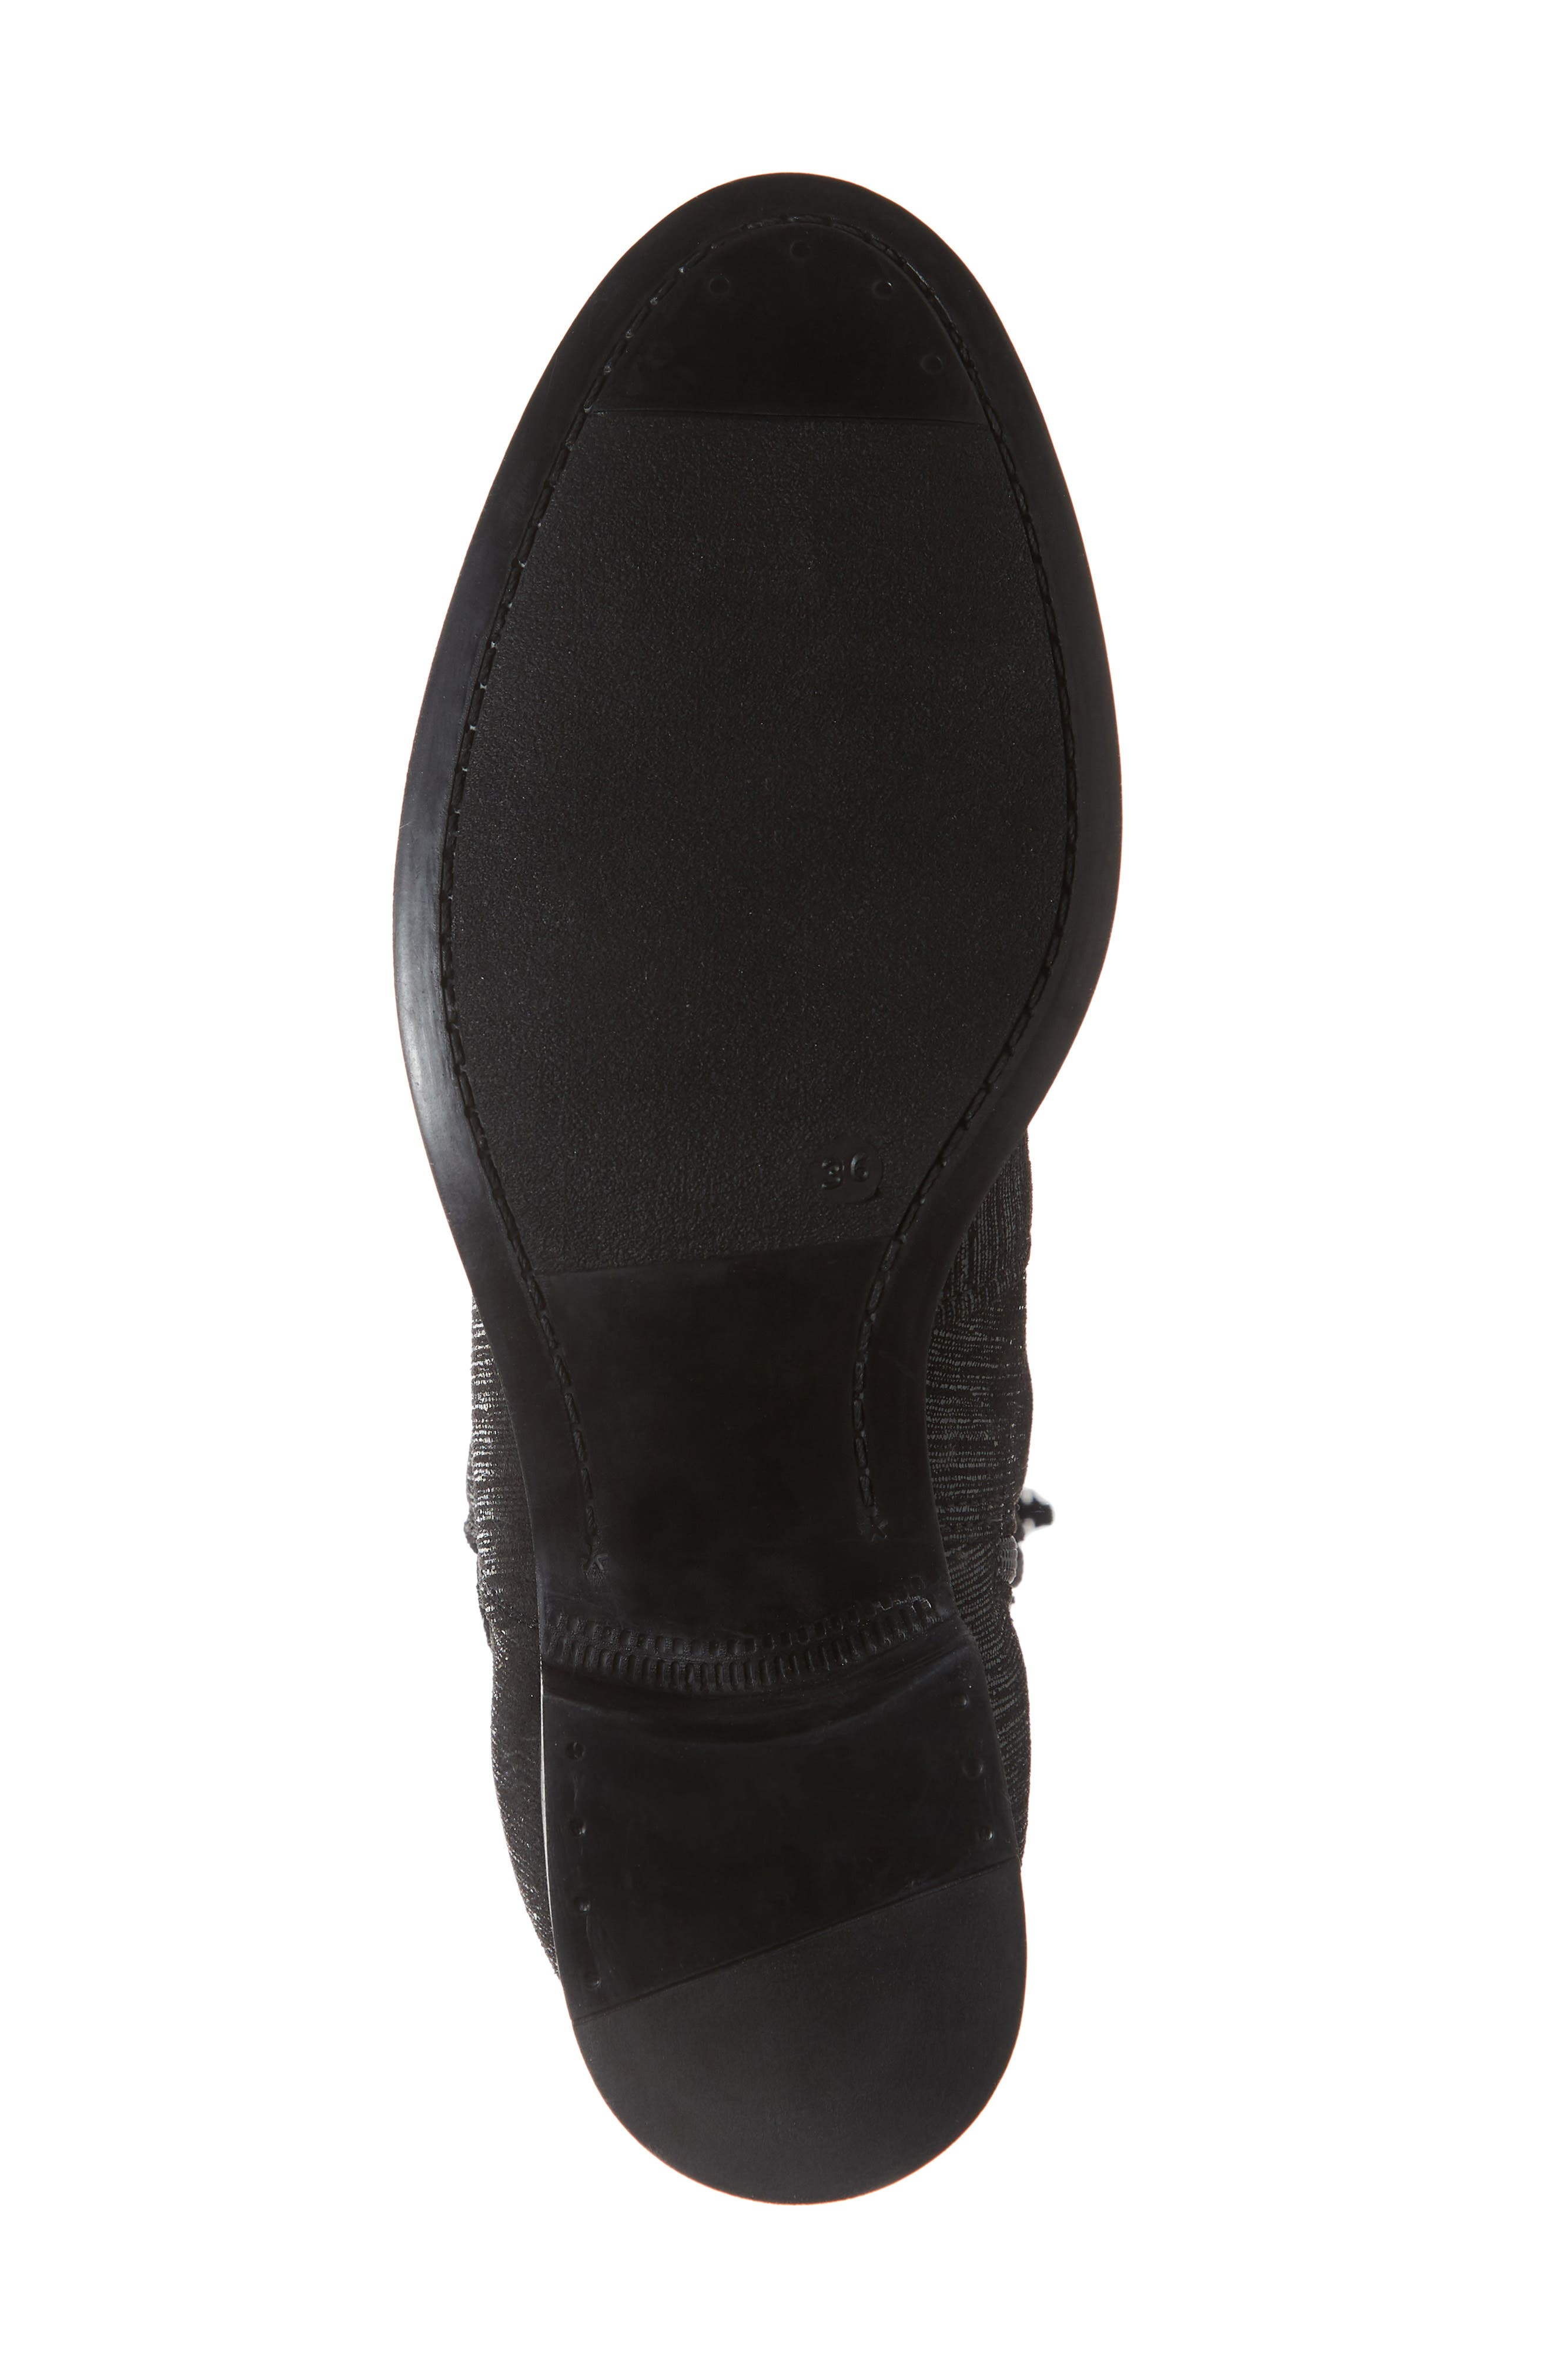 Bunt Waterproof Over the Knee Boot,                             Alternate thumbnail 6, color,                             Black Metal/ Lycra